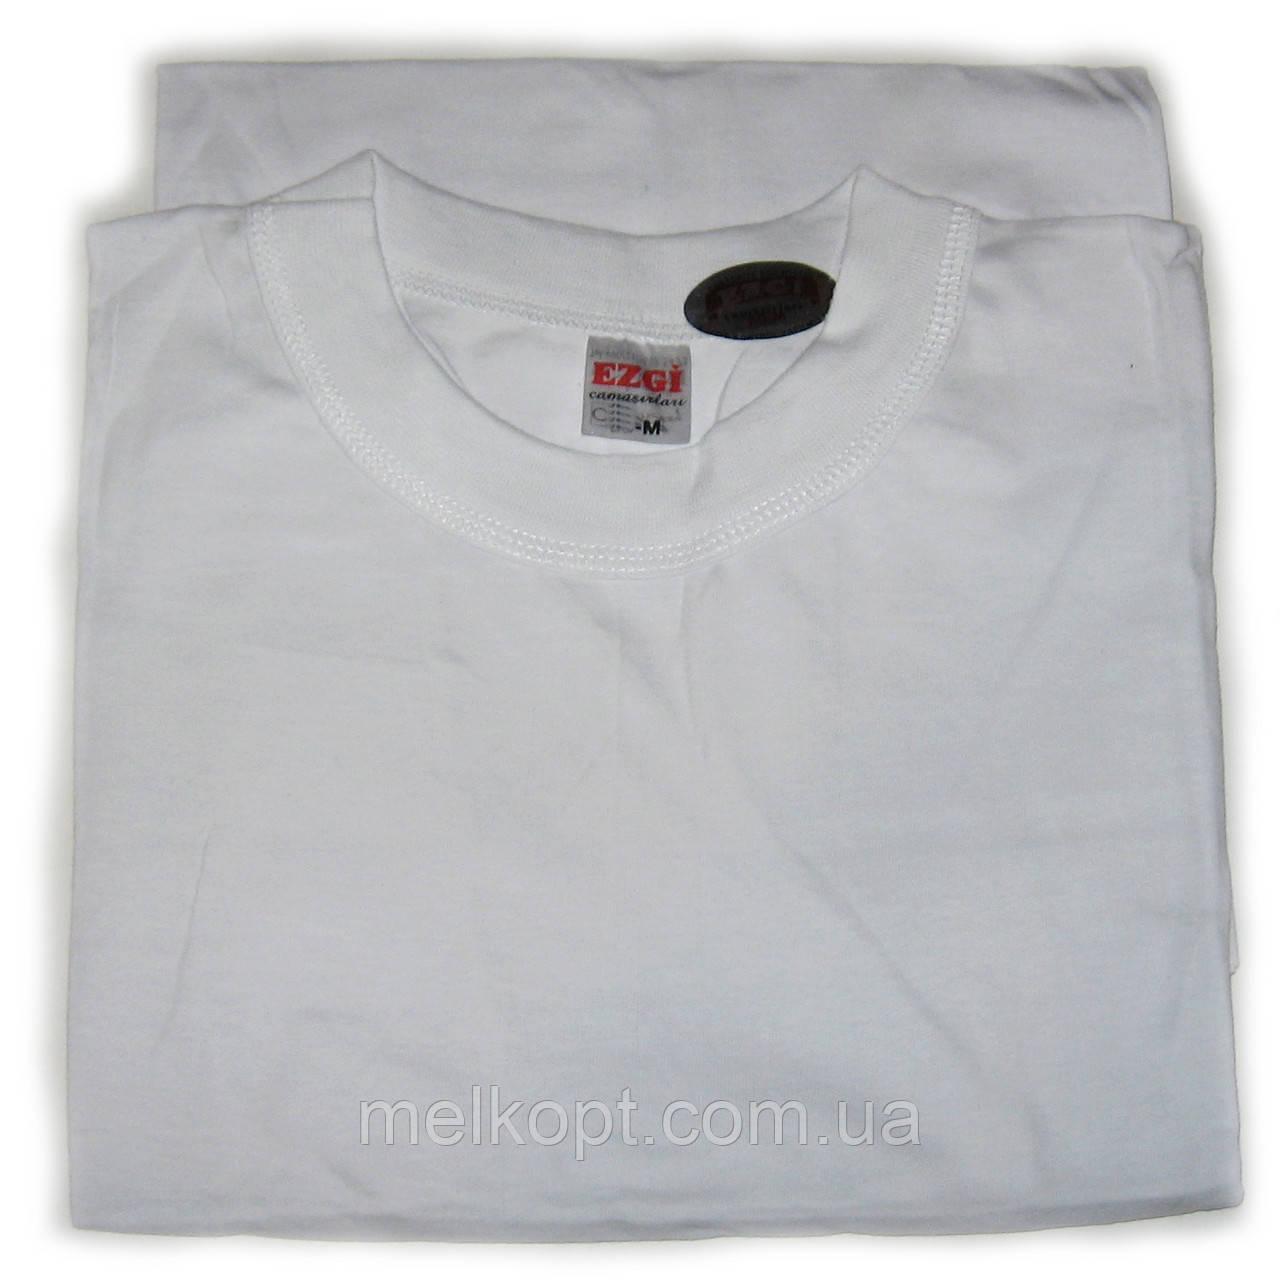 Мужские футболки Ezgi - 72,00 грн./шт. (80-й размер, белые)